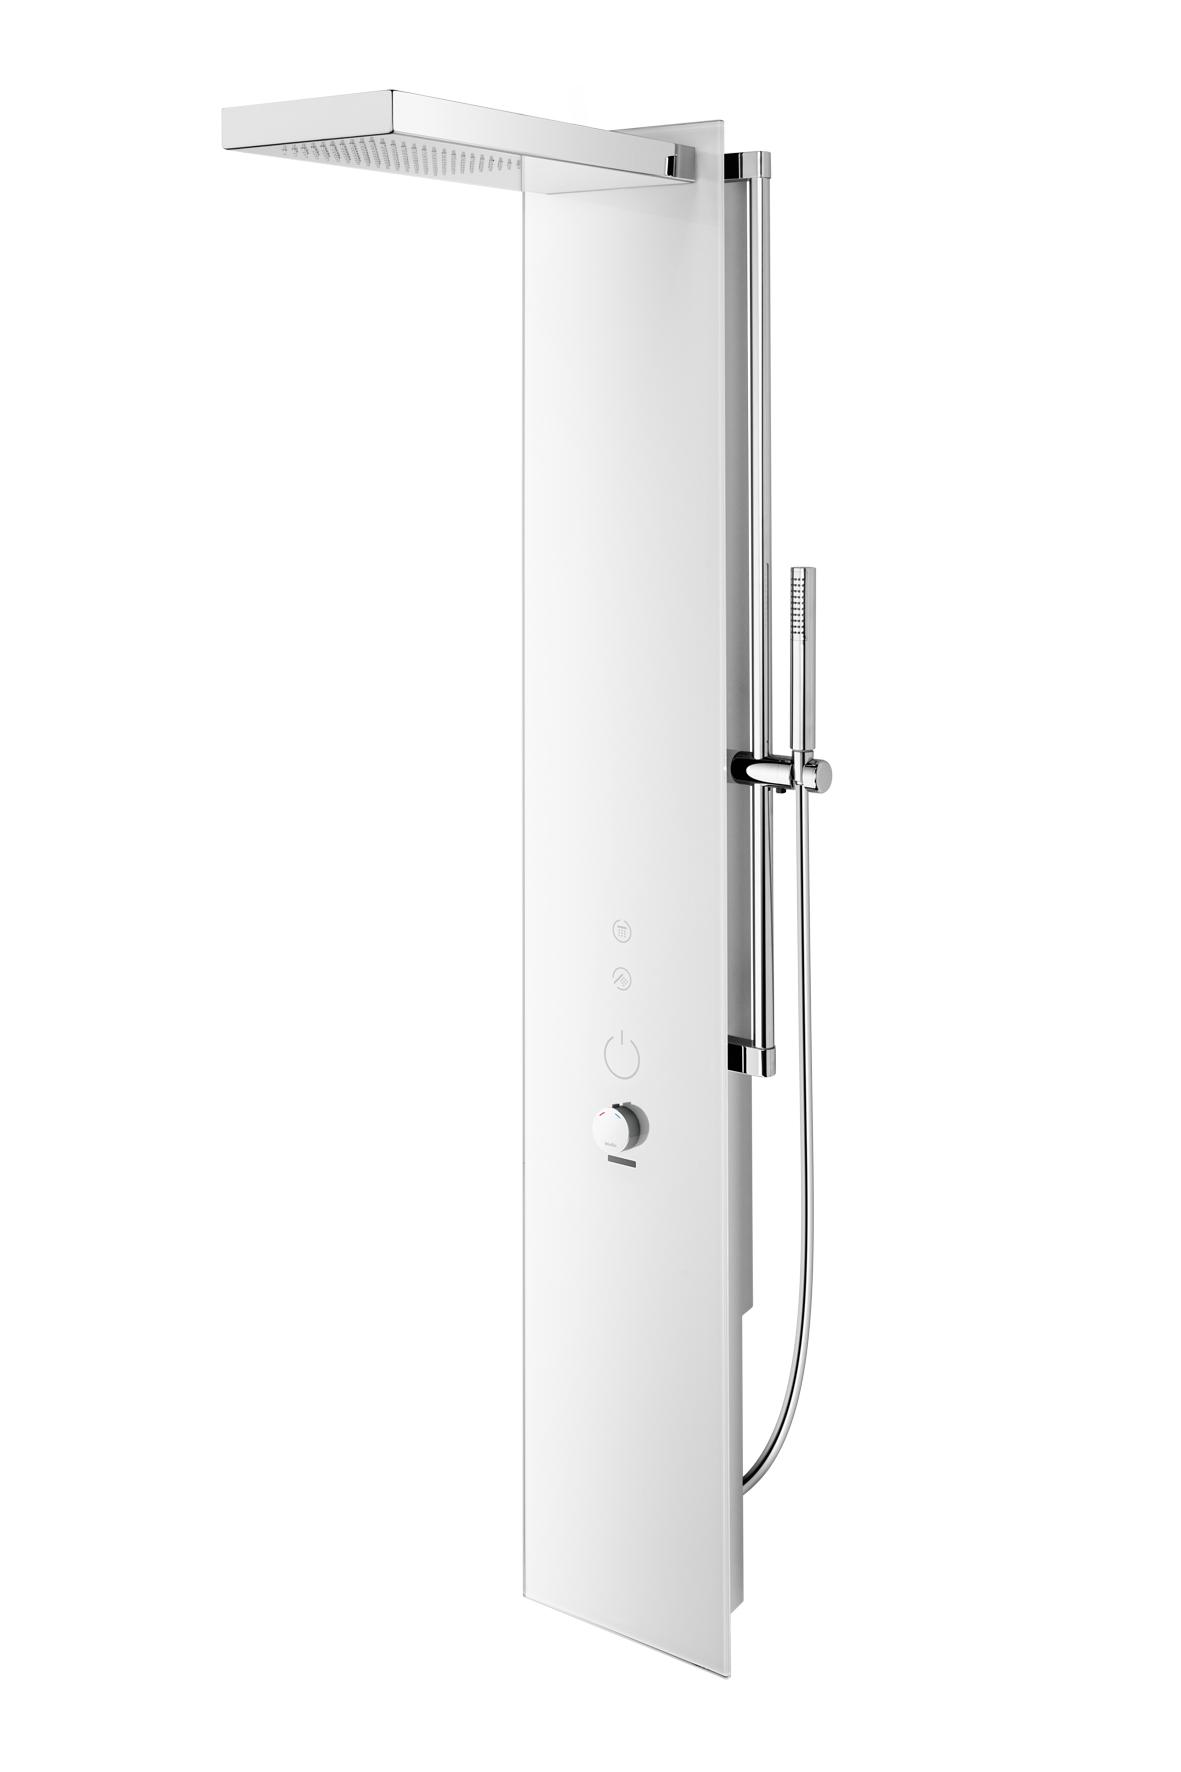 wimtec ocean p7 12 v elektronisches duschpaneel mit thermostat f r batteriebetrieb in glas. Black Bedroom Furniture Sets. Home Design Ideas